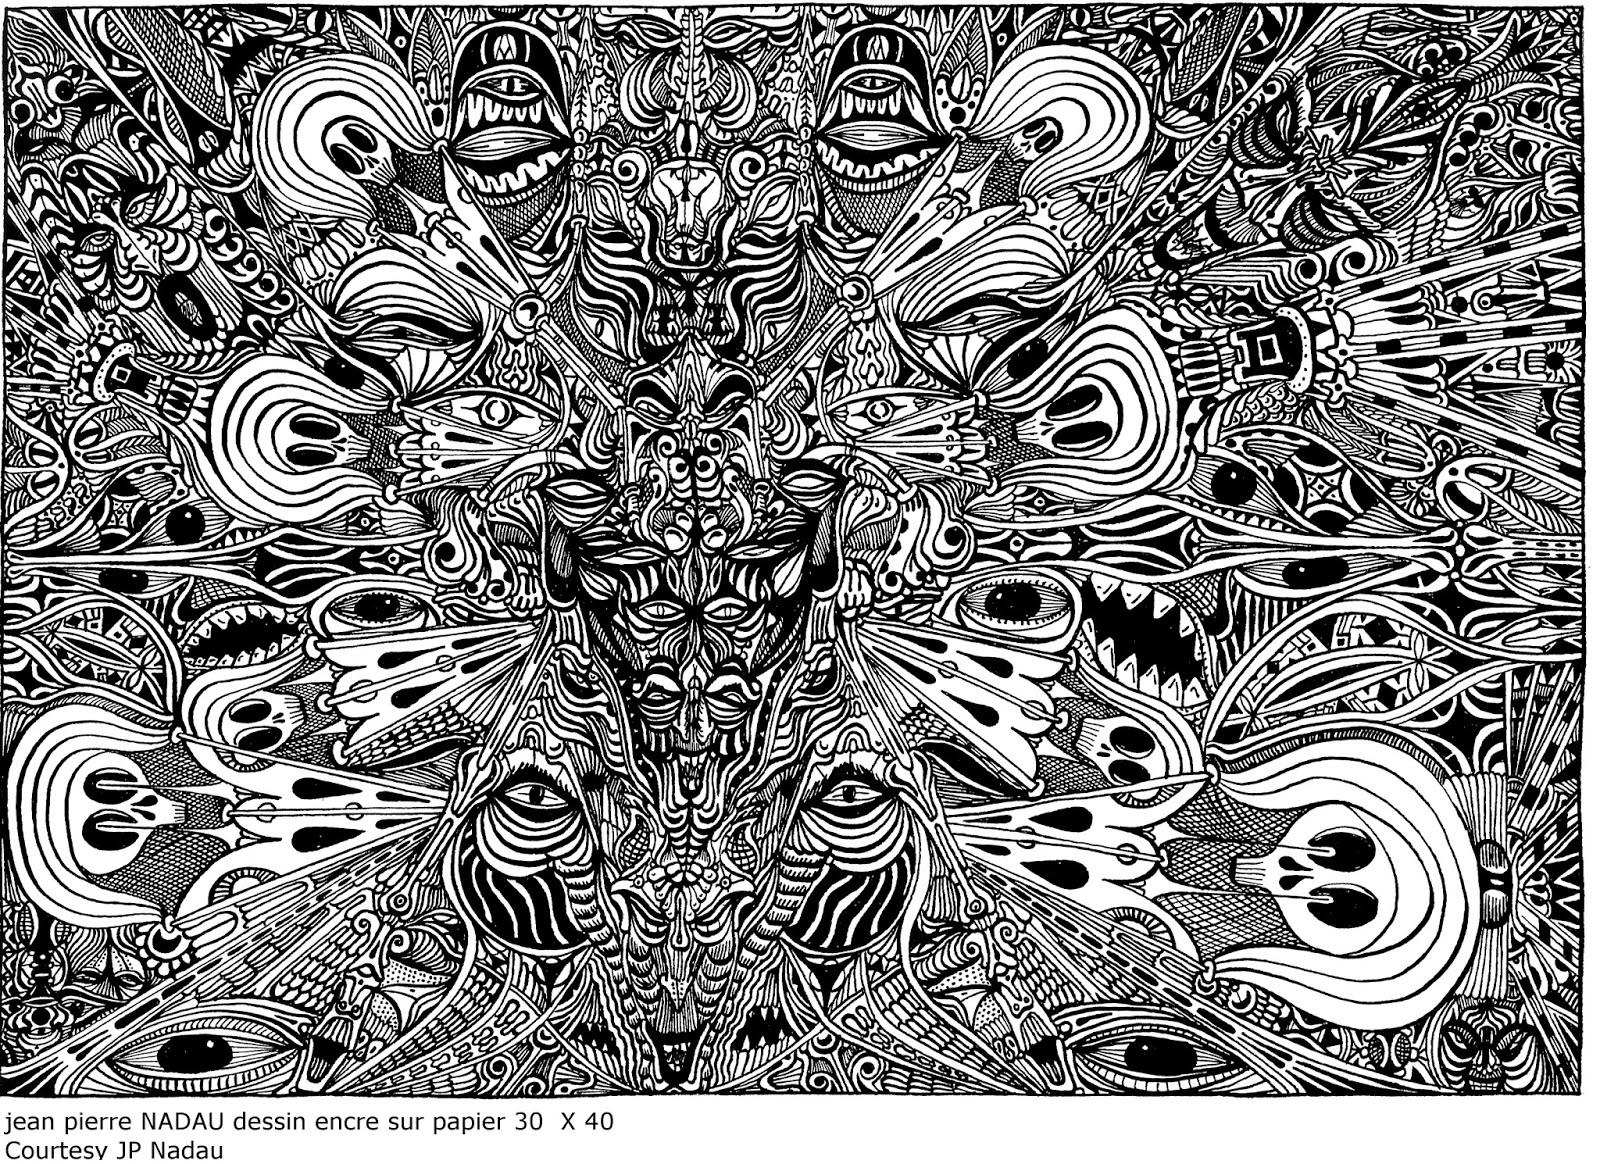 jean pierre nadau exposition - dessin encre de chine siphon